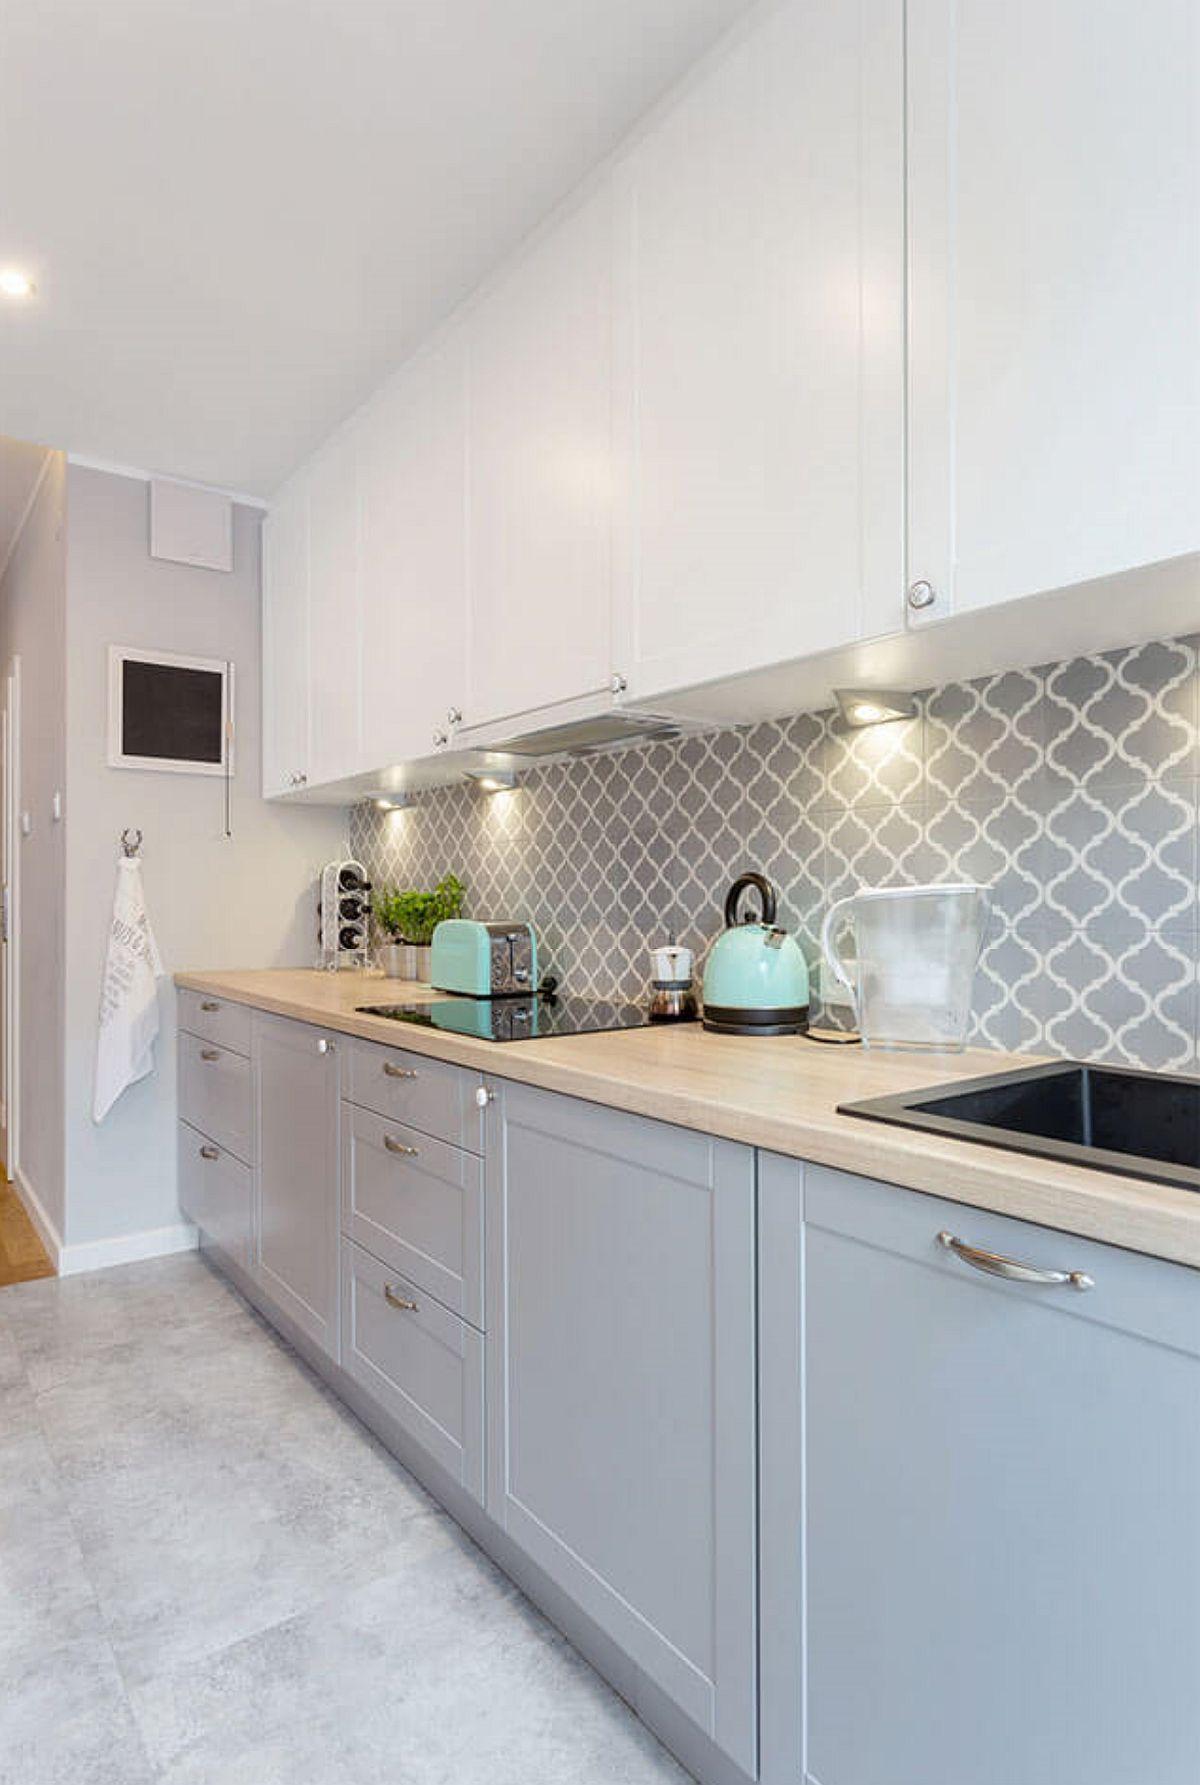 adelaparvu.com despre apartament de 2 camere luminos amenajat, design Kameleon, Foto Michal Mlynarczyk (4)